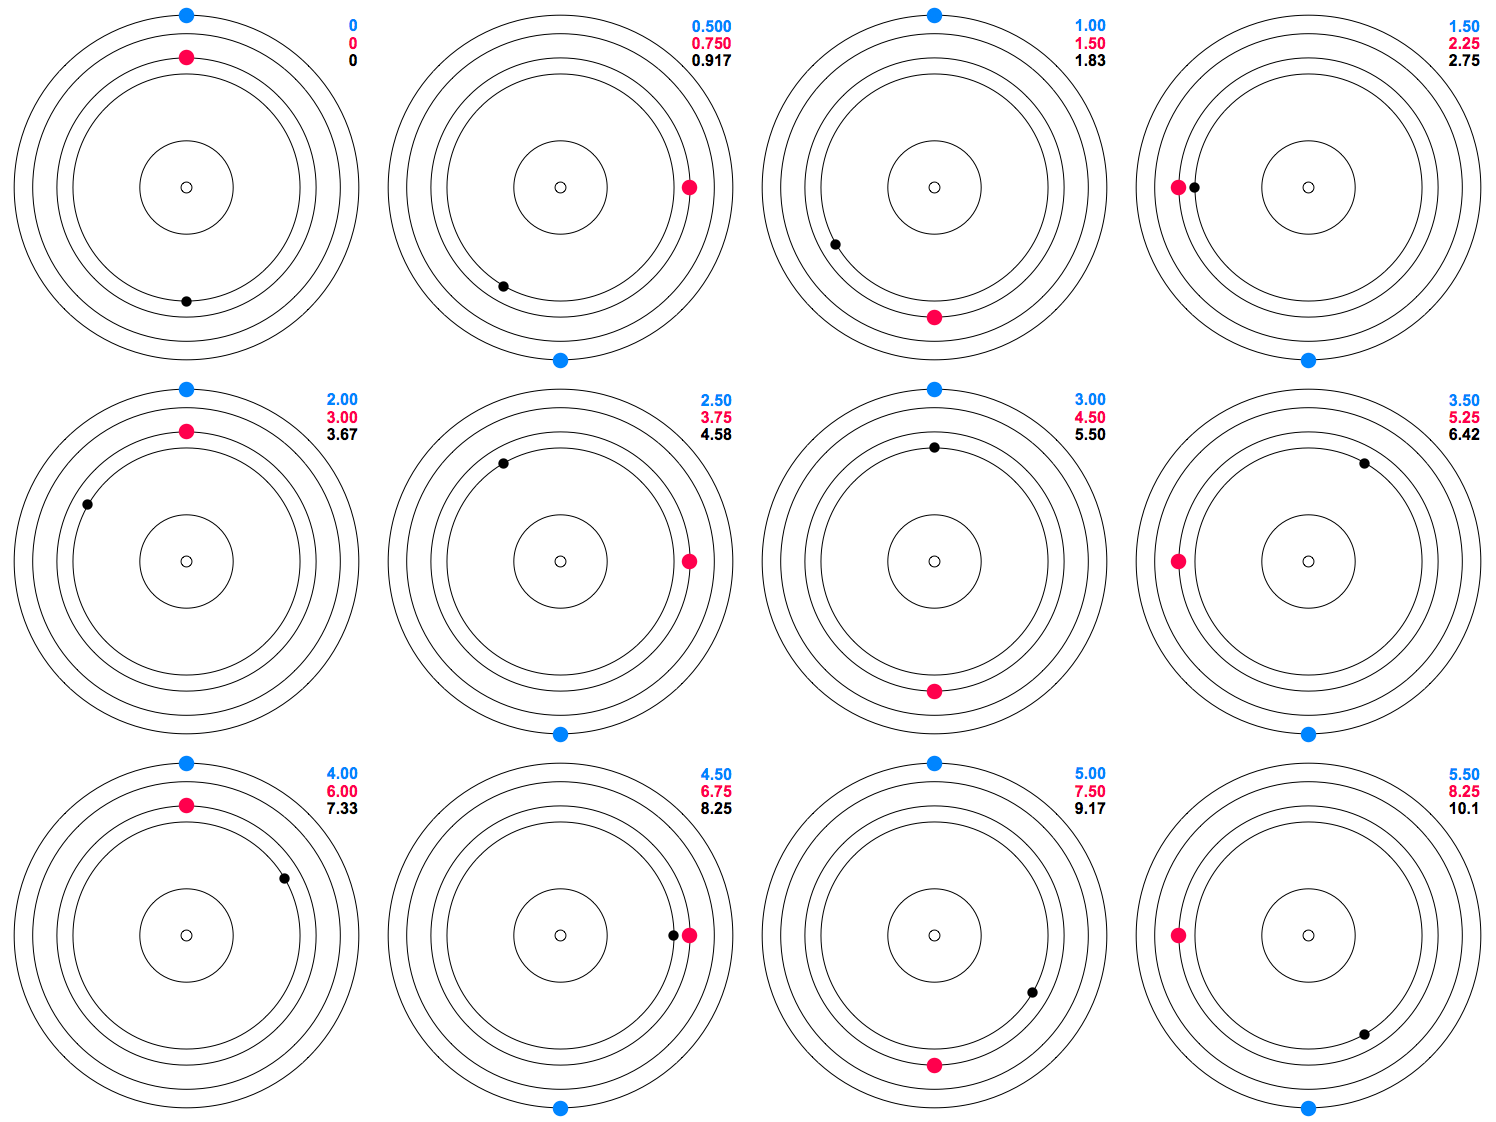 File Hydra Nix Styx Orbital Resonance Cycle